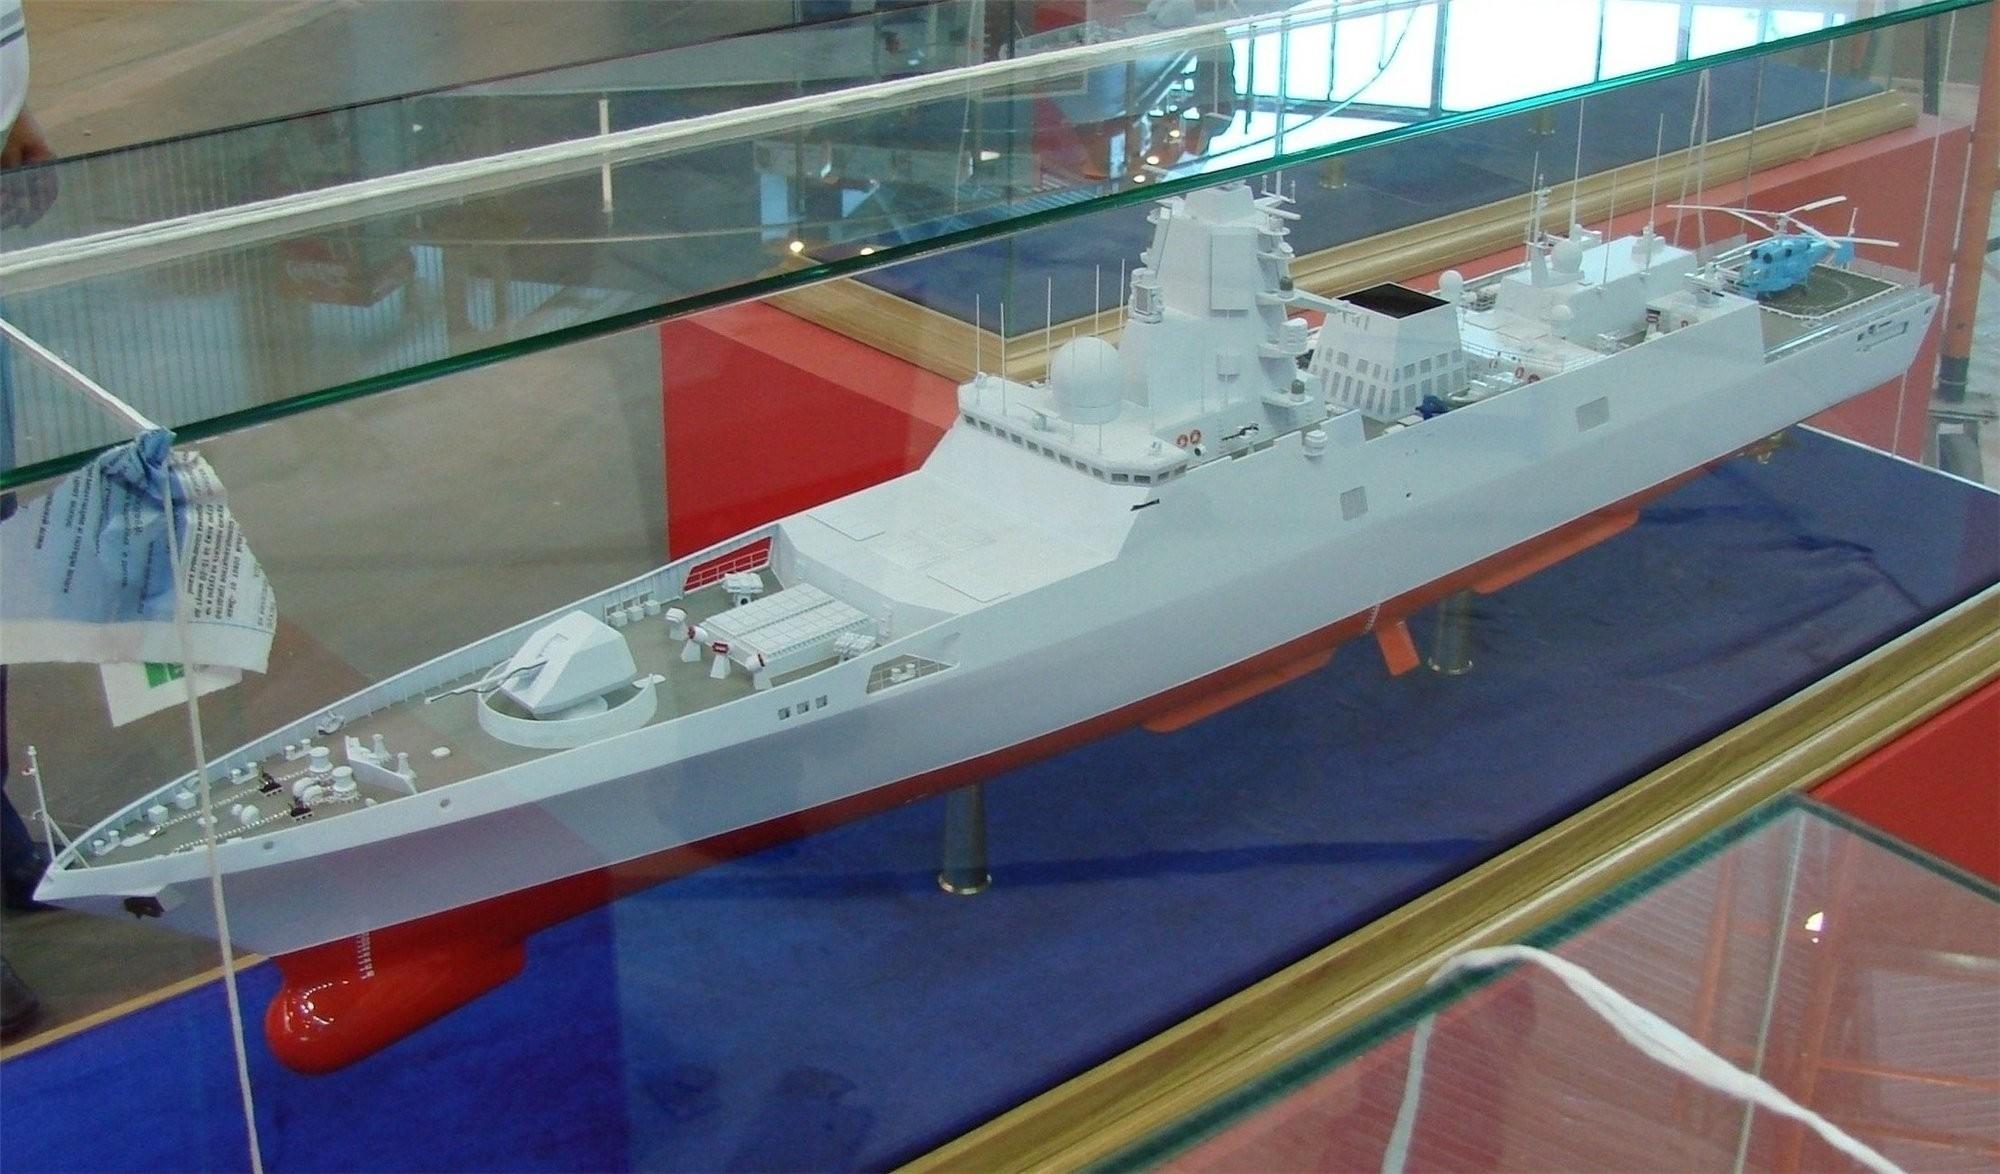 Project 22350: Admiral Sergei Gorshkov #2 - Page 18 F_czAxNy5yYWRpa2FsLnJ1L2k0NDEvMTIxMS9jYy9mOGEyZjc2MWU1NjQuanBnP19faWQ9NDM1MTE=